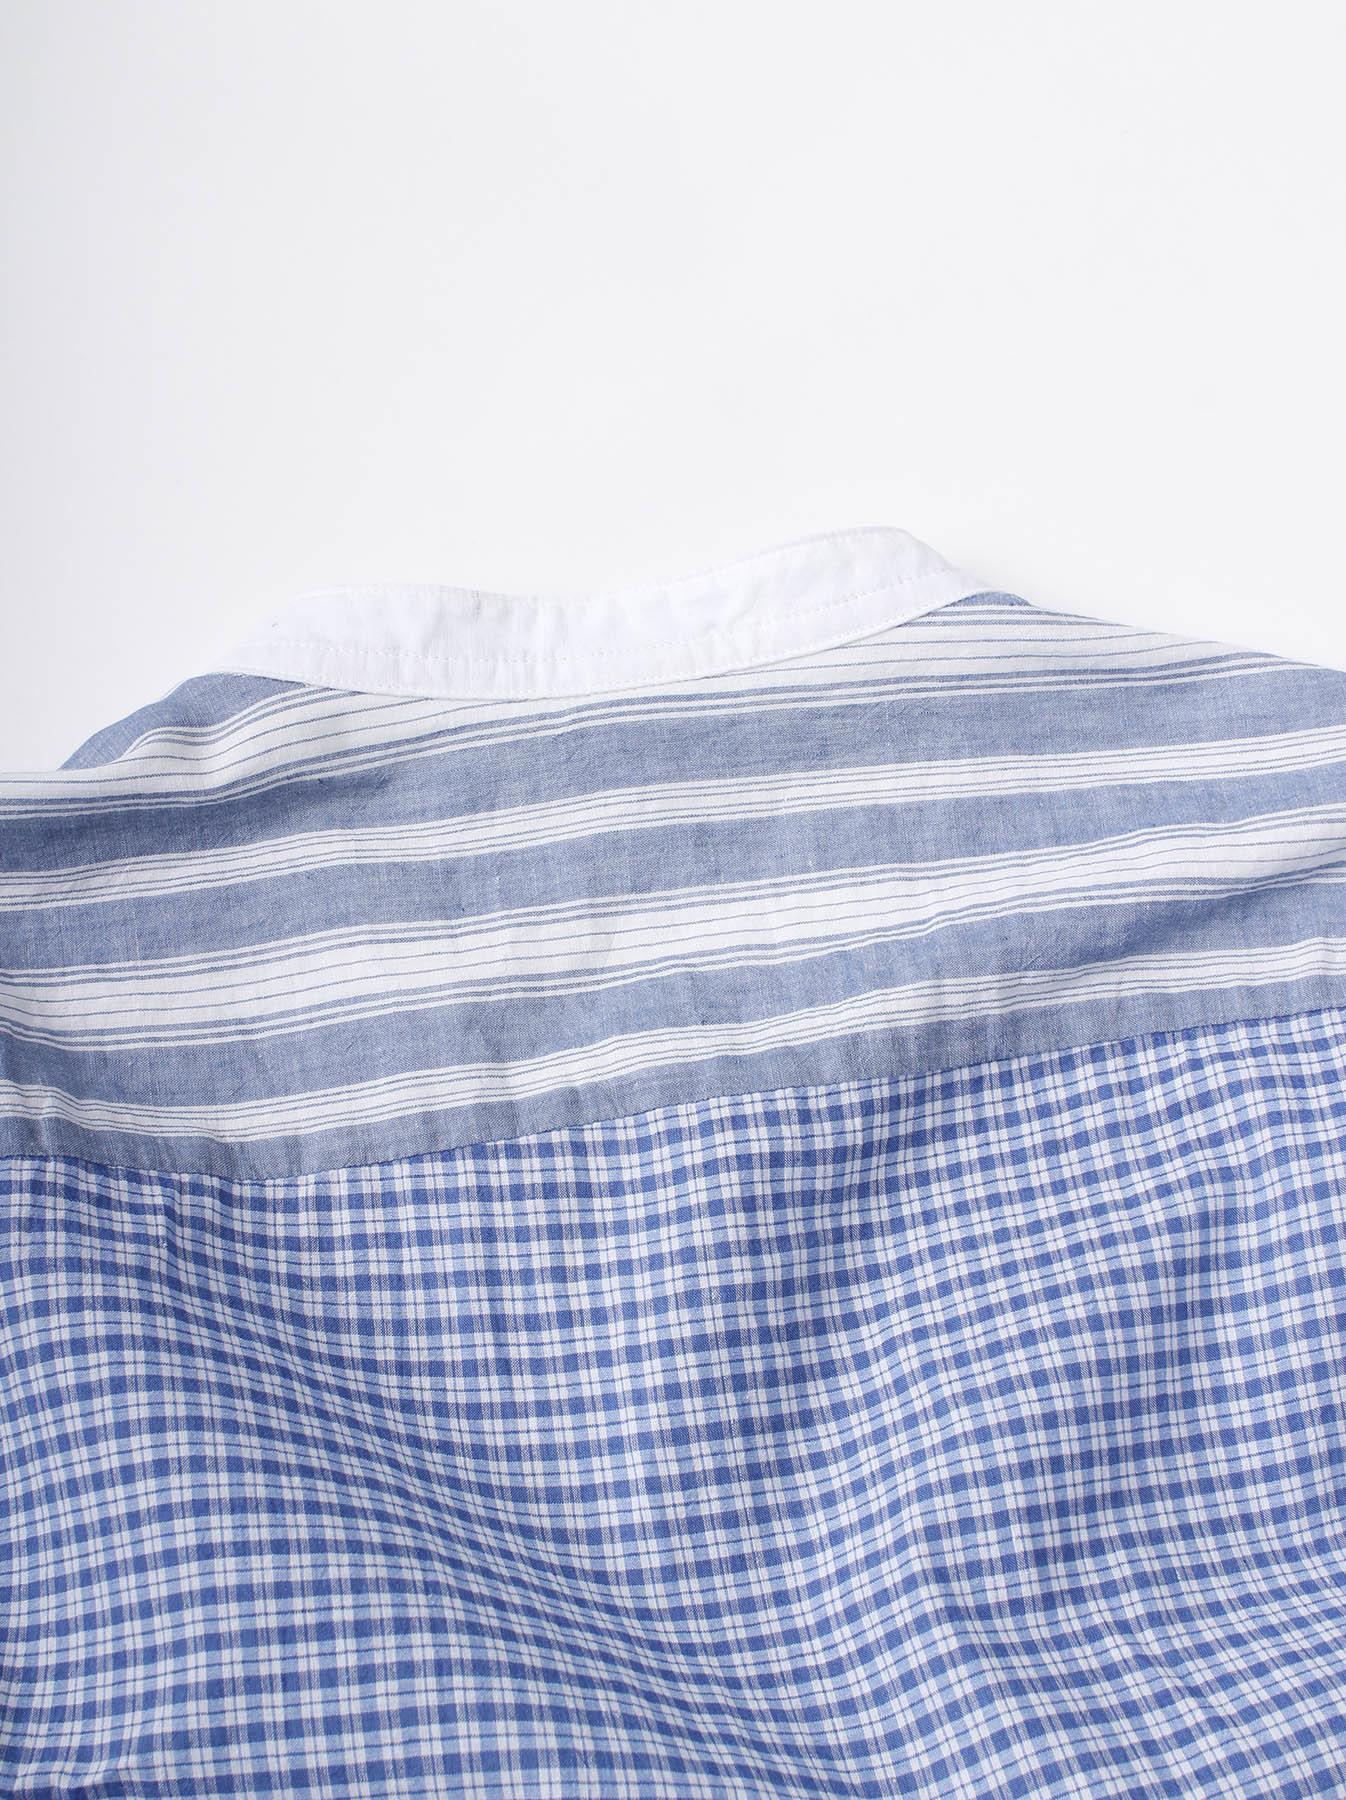 WH Mix Ai-kaze Khadi Pullover Shirt-4